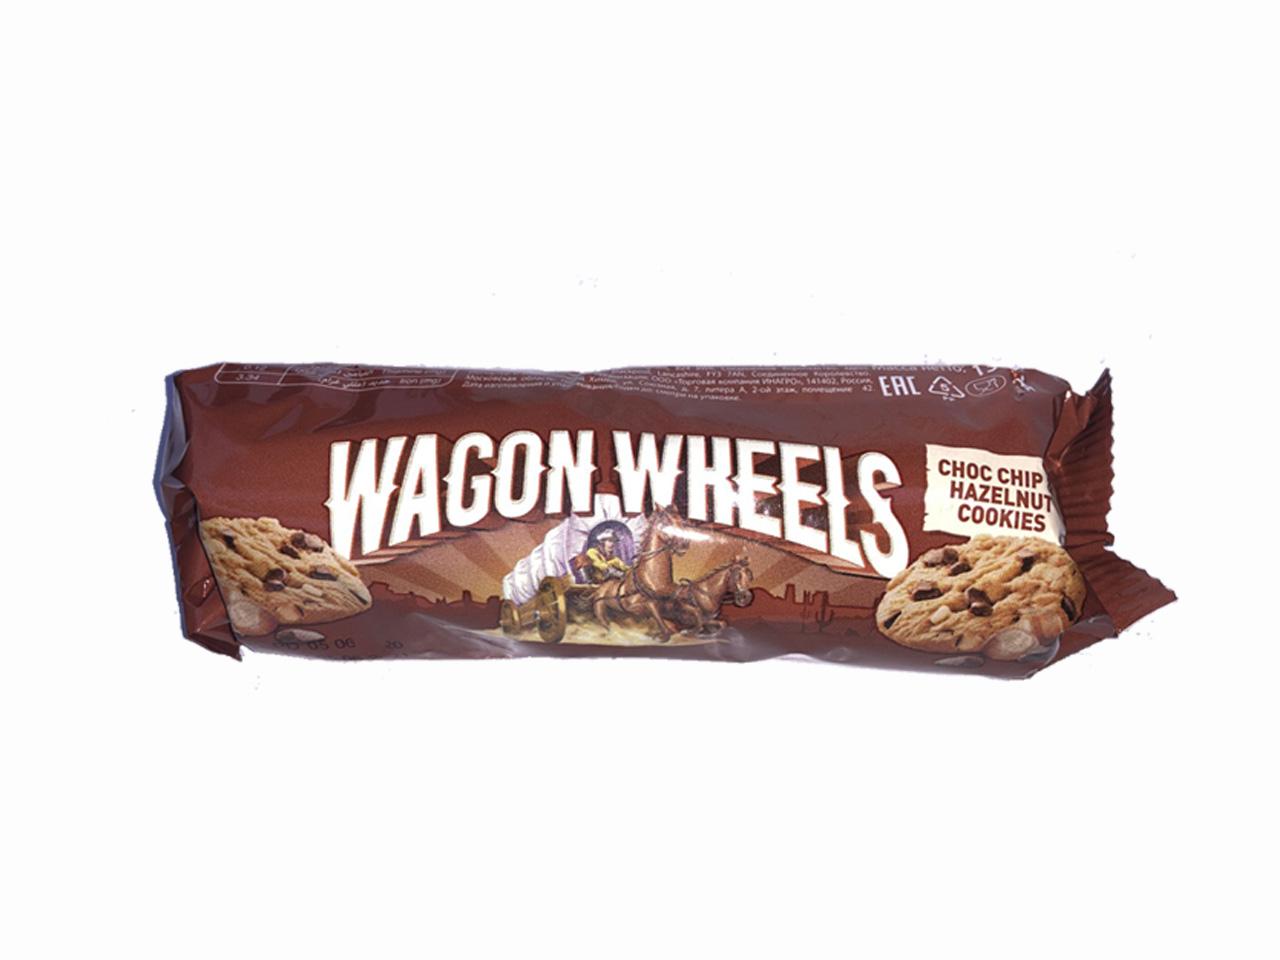 Wagon Wheels Choc Chip Cookies